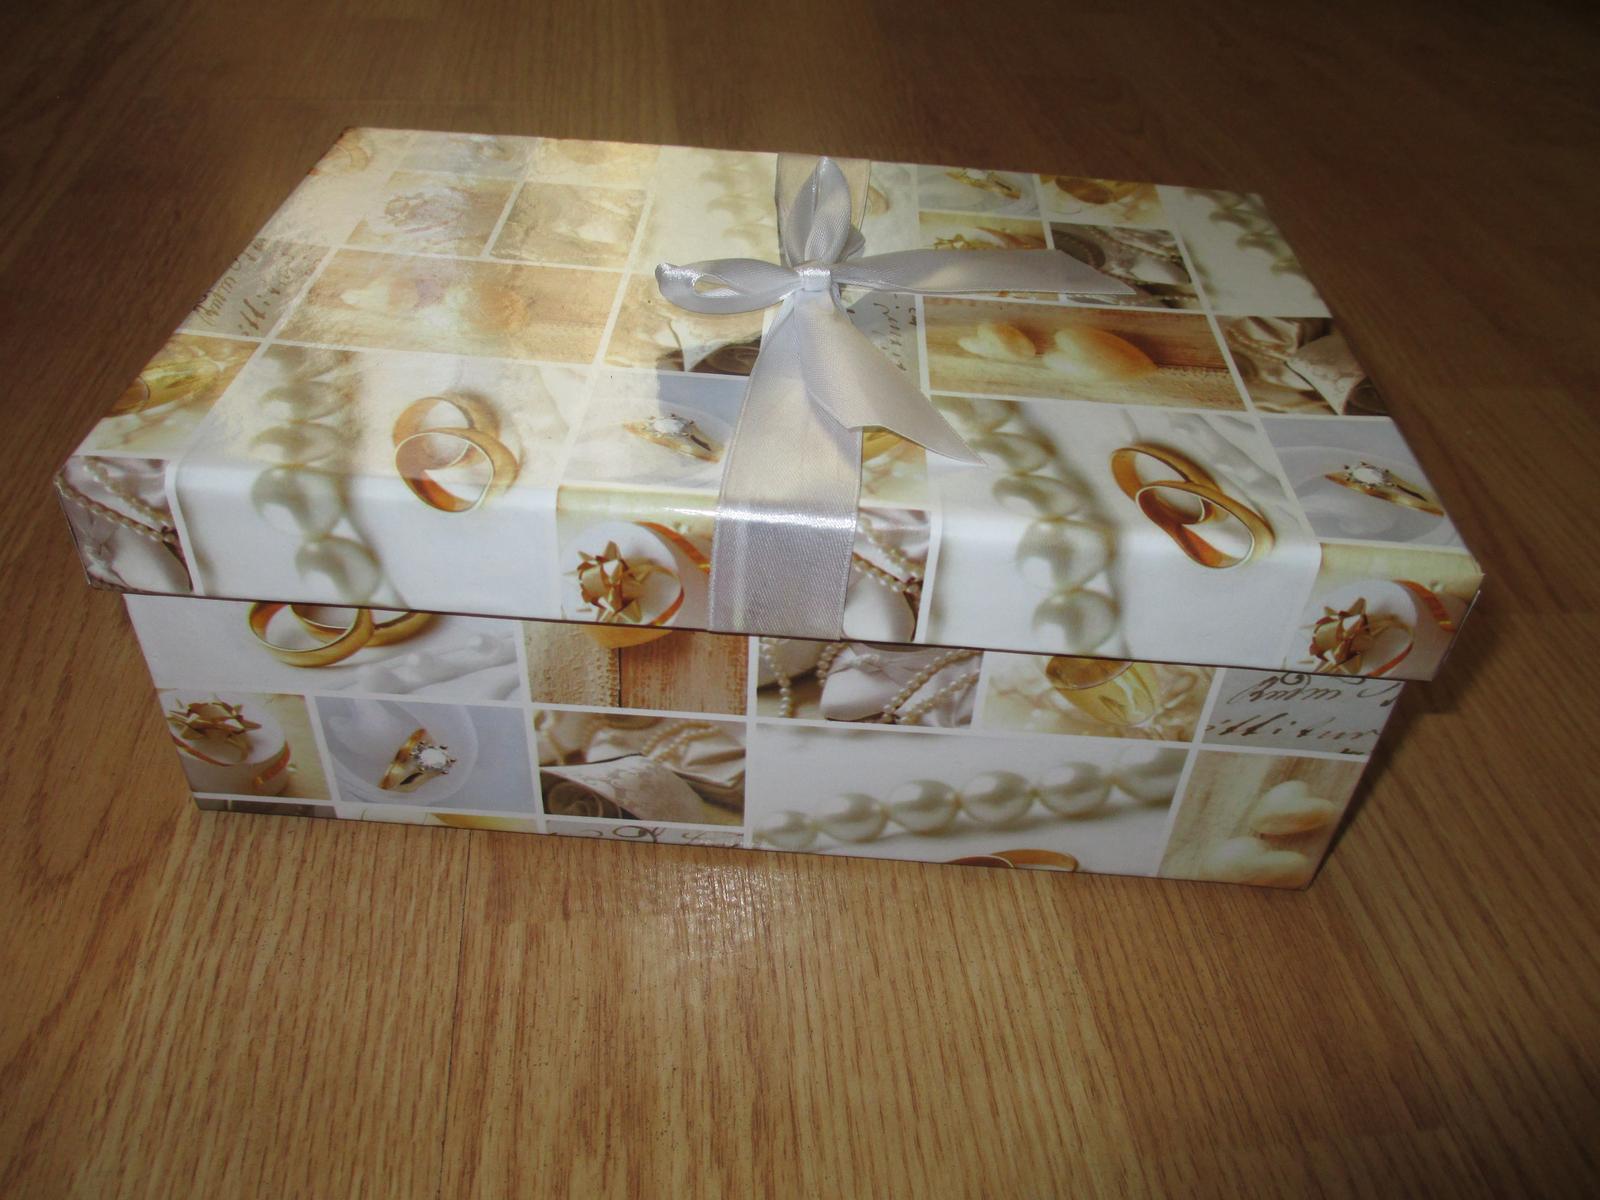 Svadobna krabica - Obrázok č. 2